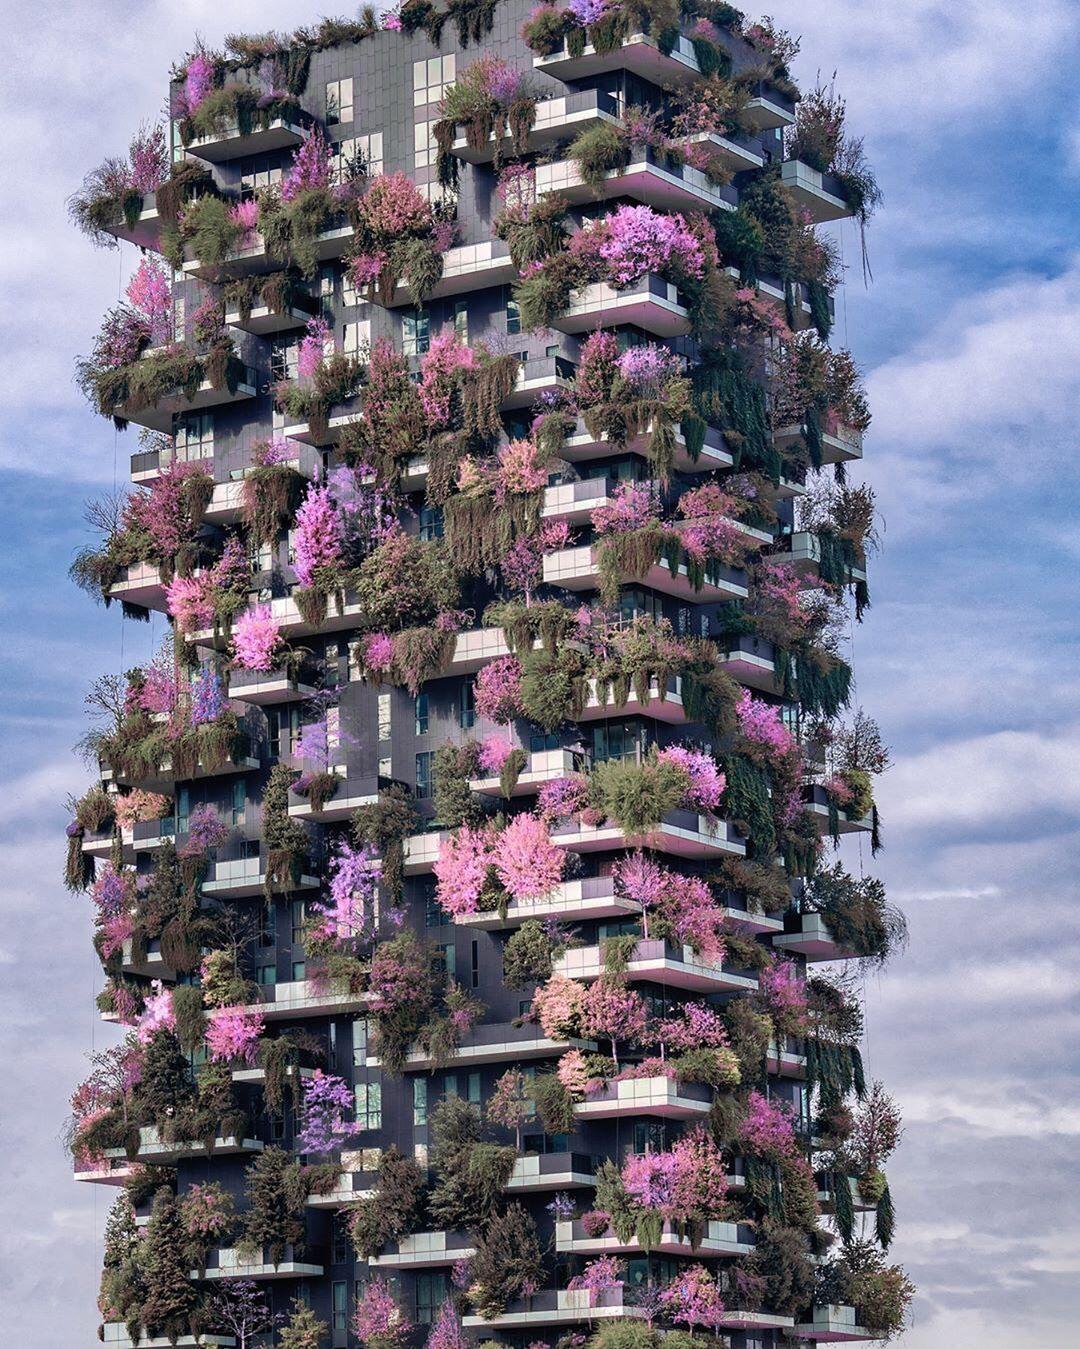 Foto Bosco Verticale Milano bosco verticale 🏡 milan, italy. photo by @kyrenian #nature